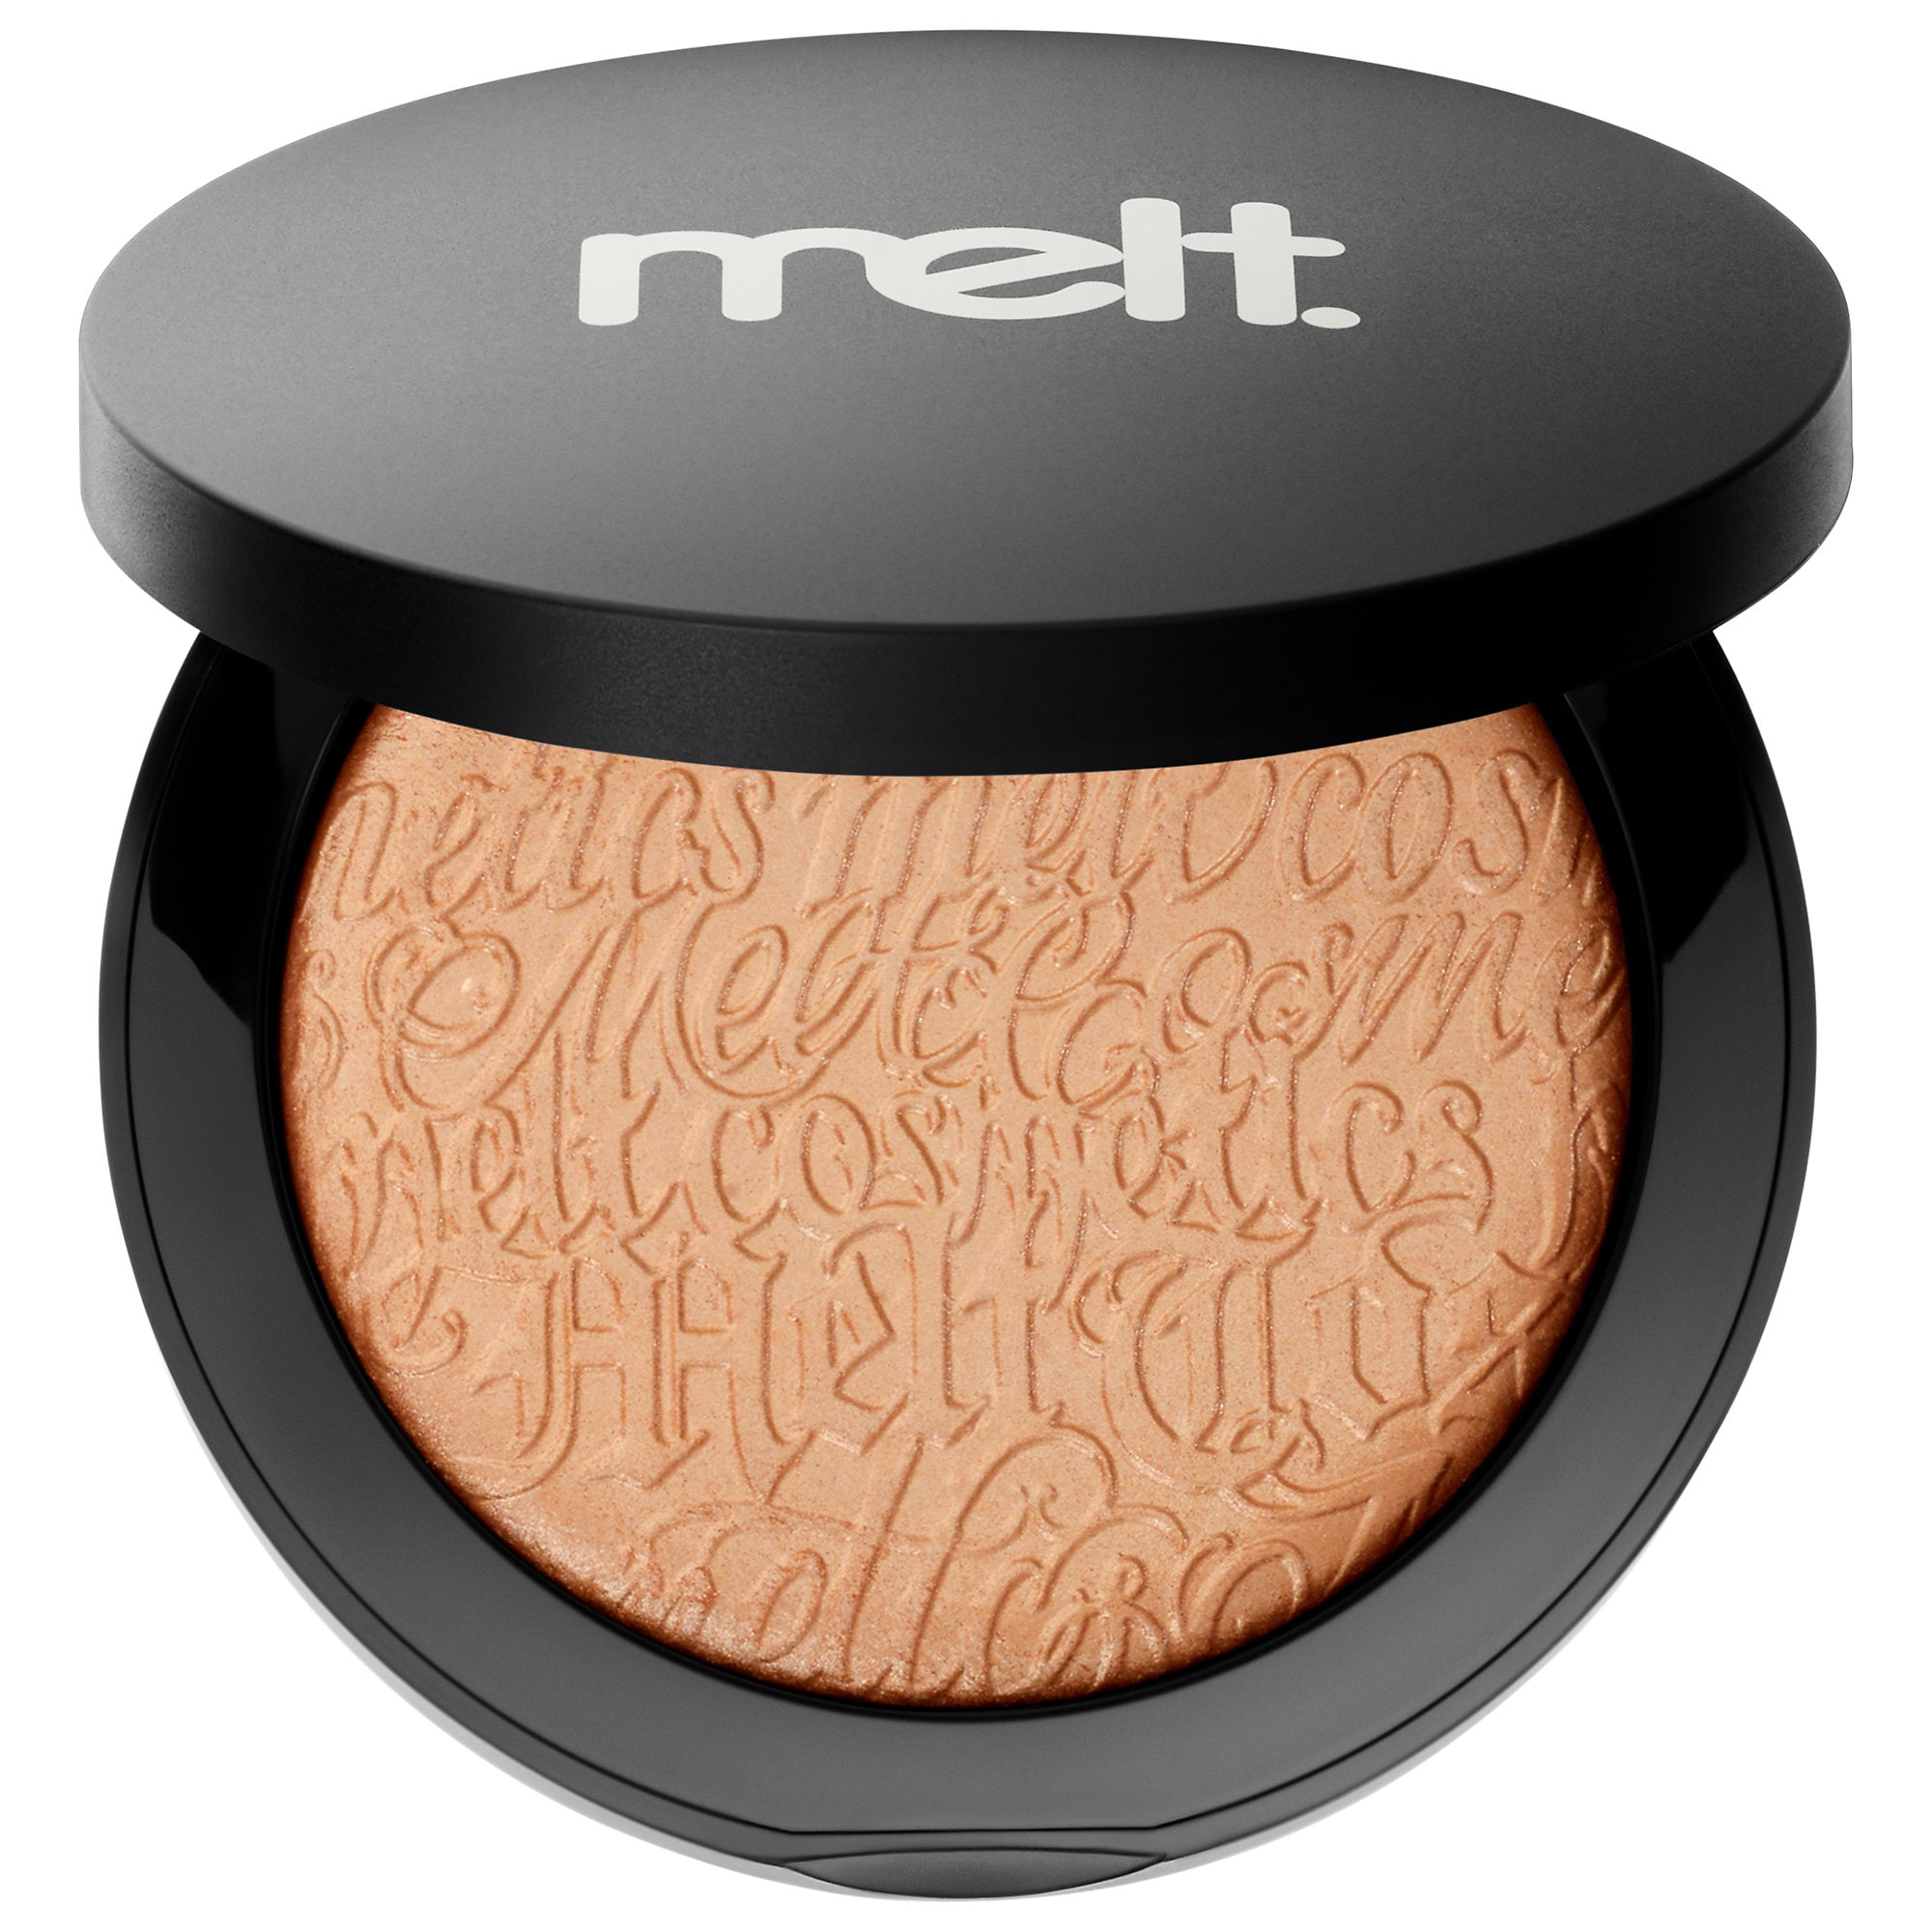 Melt Cosmetics - Digital Dust Highlight